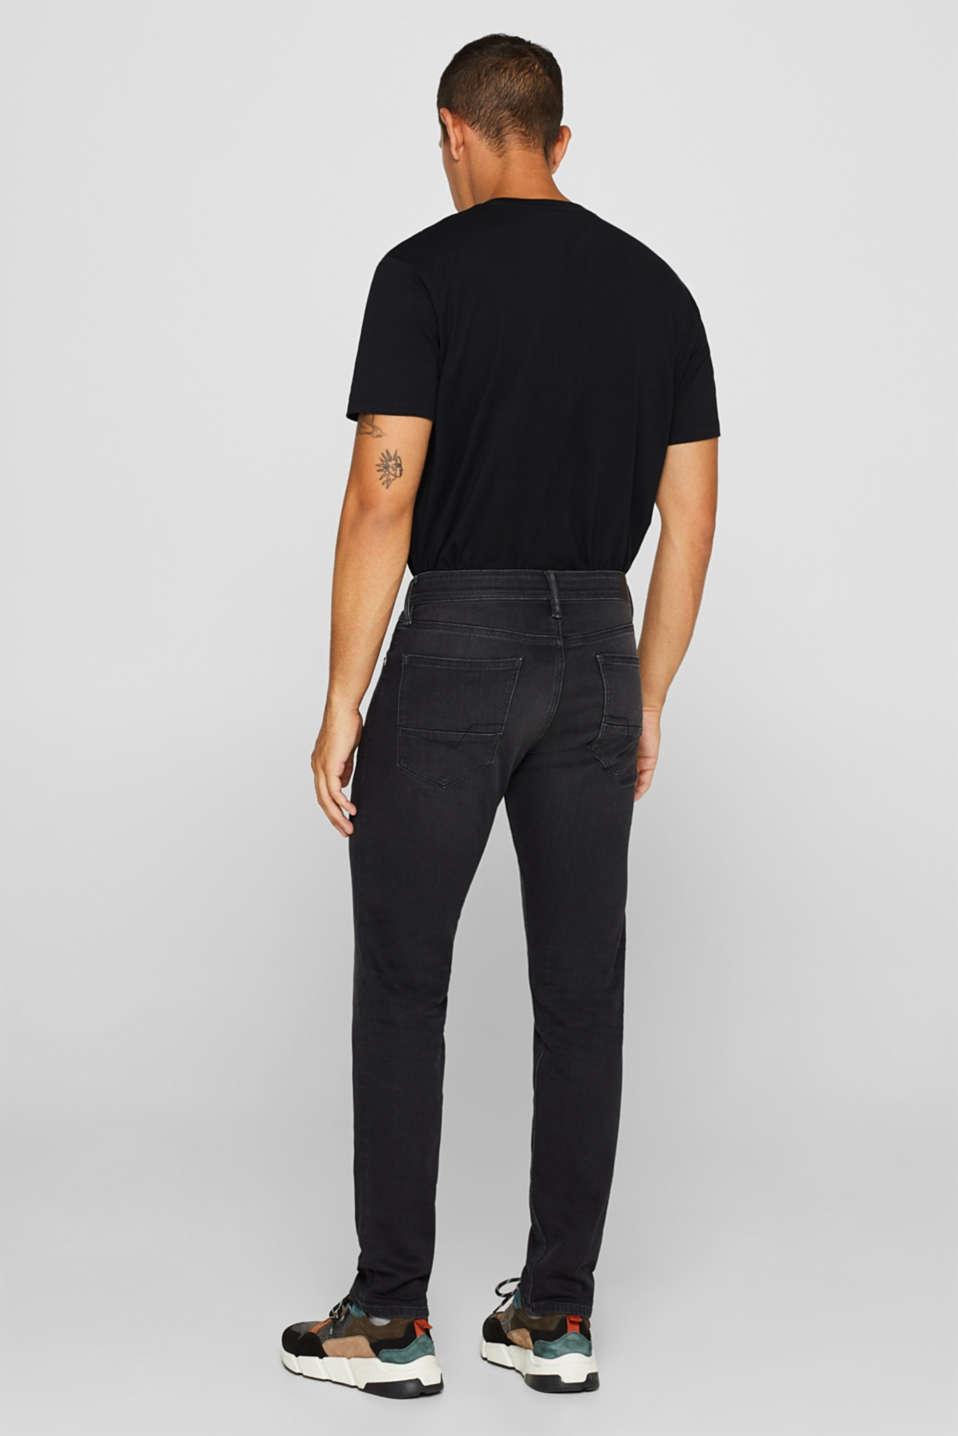 Pants denim, BLACK MEDIUM WASH, detail image number 1